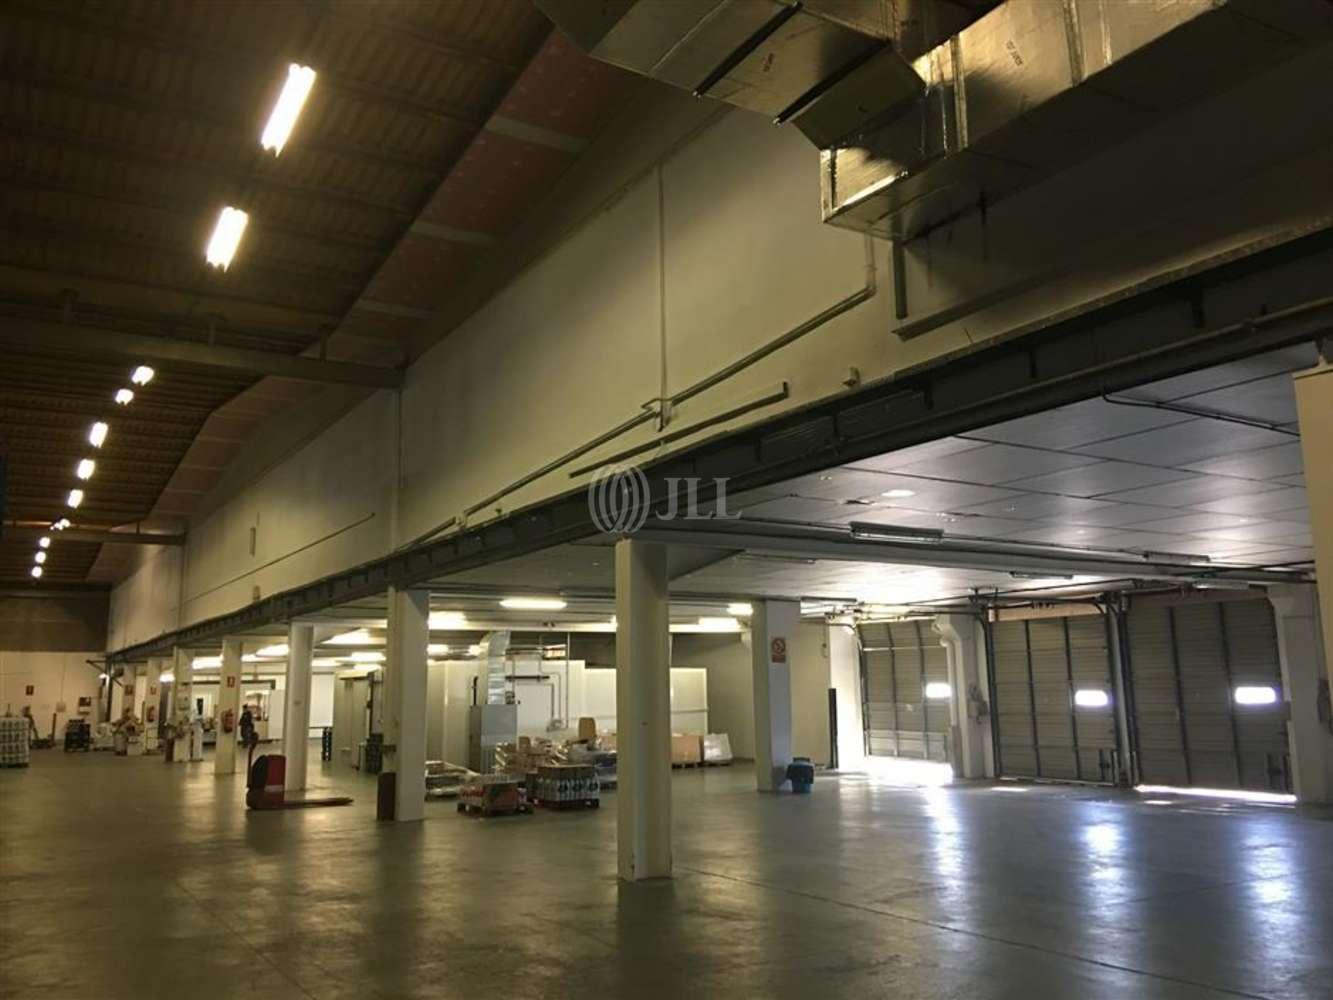 Naves industriales y logísticas Sant fruitós de bages, 08272 - Nave Logistica - B0425 - PI SANT ISIDRE - 8728